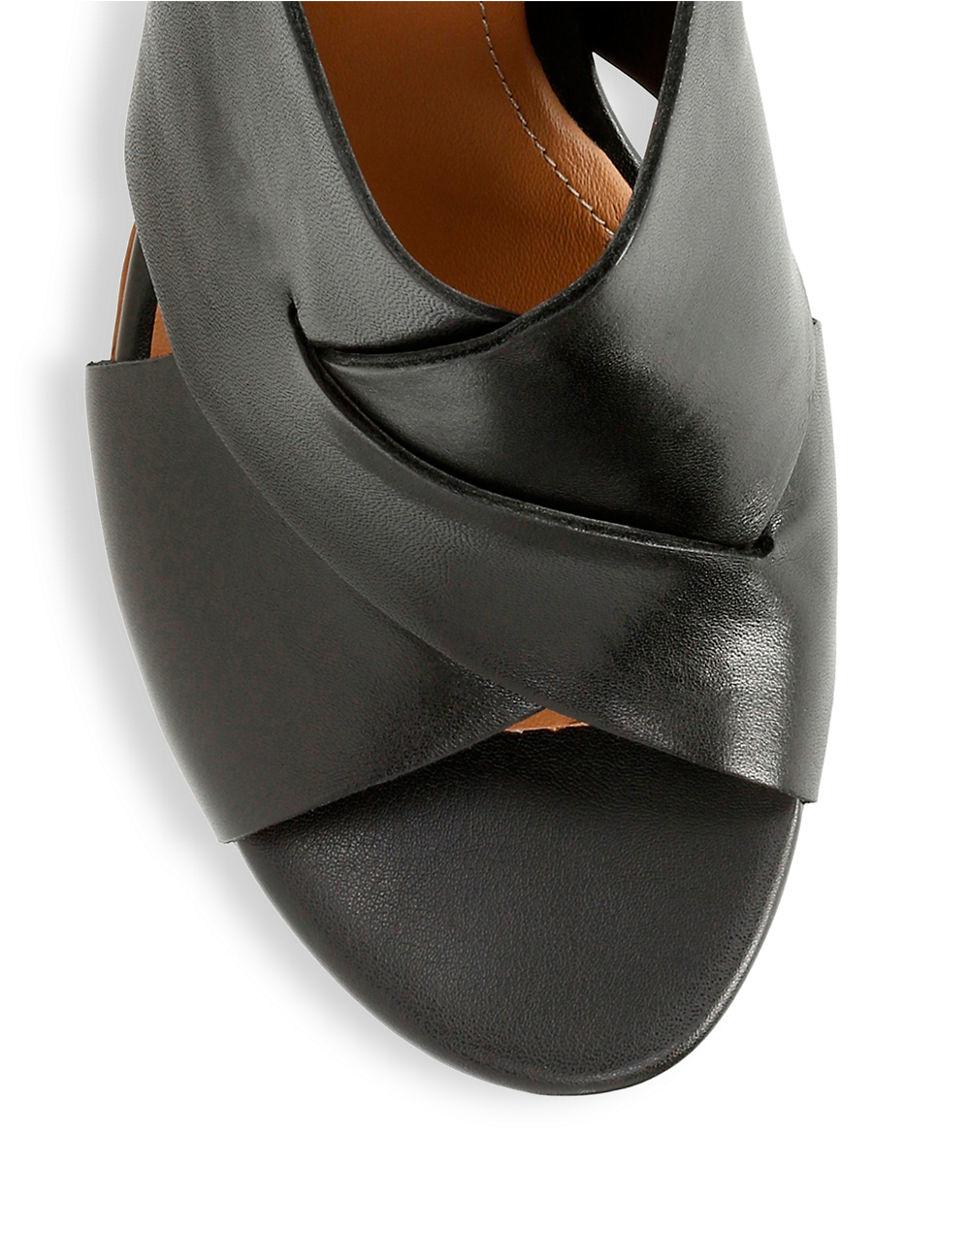 25a7d741779db Clarks Ralene Vive Full Grain Leather Slingback Sandals in Black - Lyst